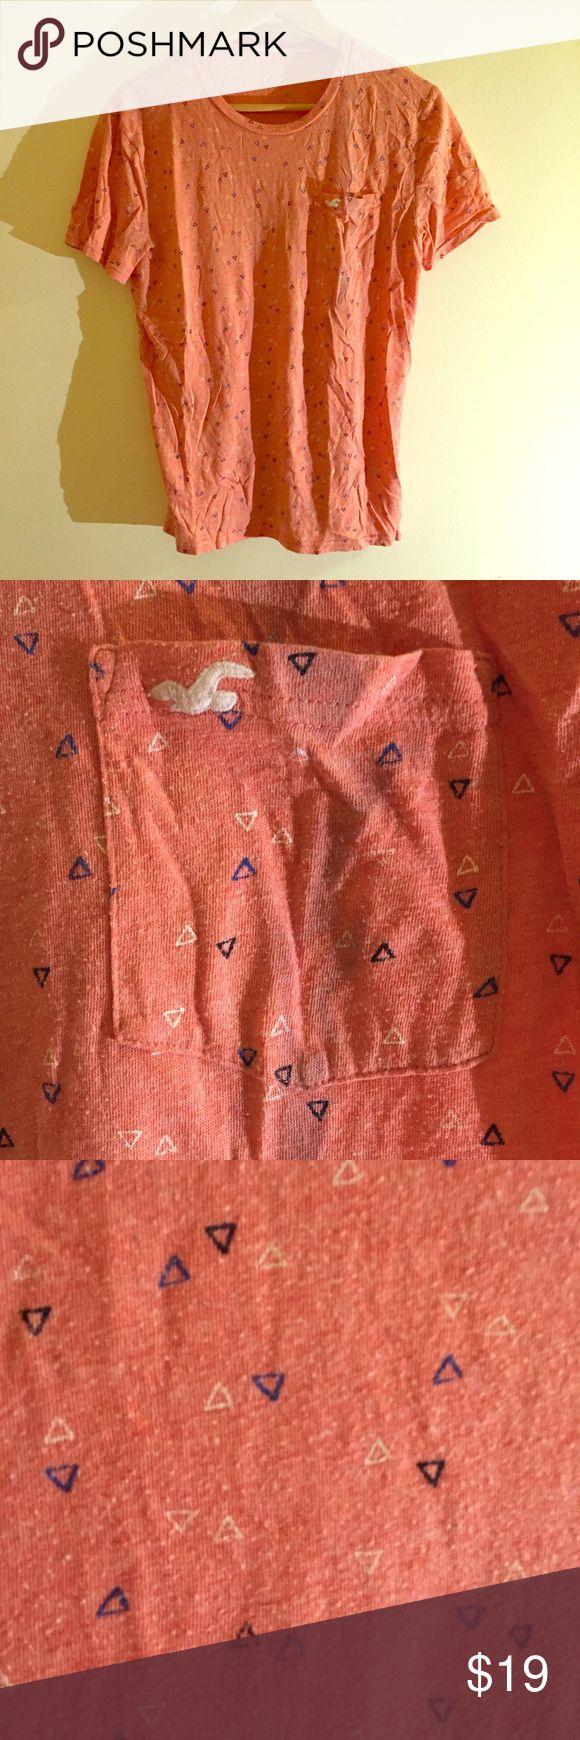 HOLLISTER Pink short sleeve men's Tshirt Super soft, trendy men's Hollister Tshirt. In great condition  Burberry; Gucci; Boss; Hugo; Saks; trousers; Jeans; blue; Armani; Calvin Klein; Tommy Hilfiger; Nike; Zara; Banana Republic; J Crew; NAUTICA ; Tommy Hilfiger; Hollister; Abercrombie and Fitch; Hollister Shirts Tees - Short Sleeve